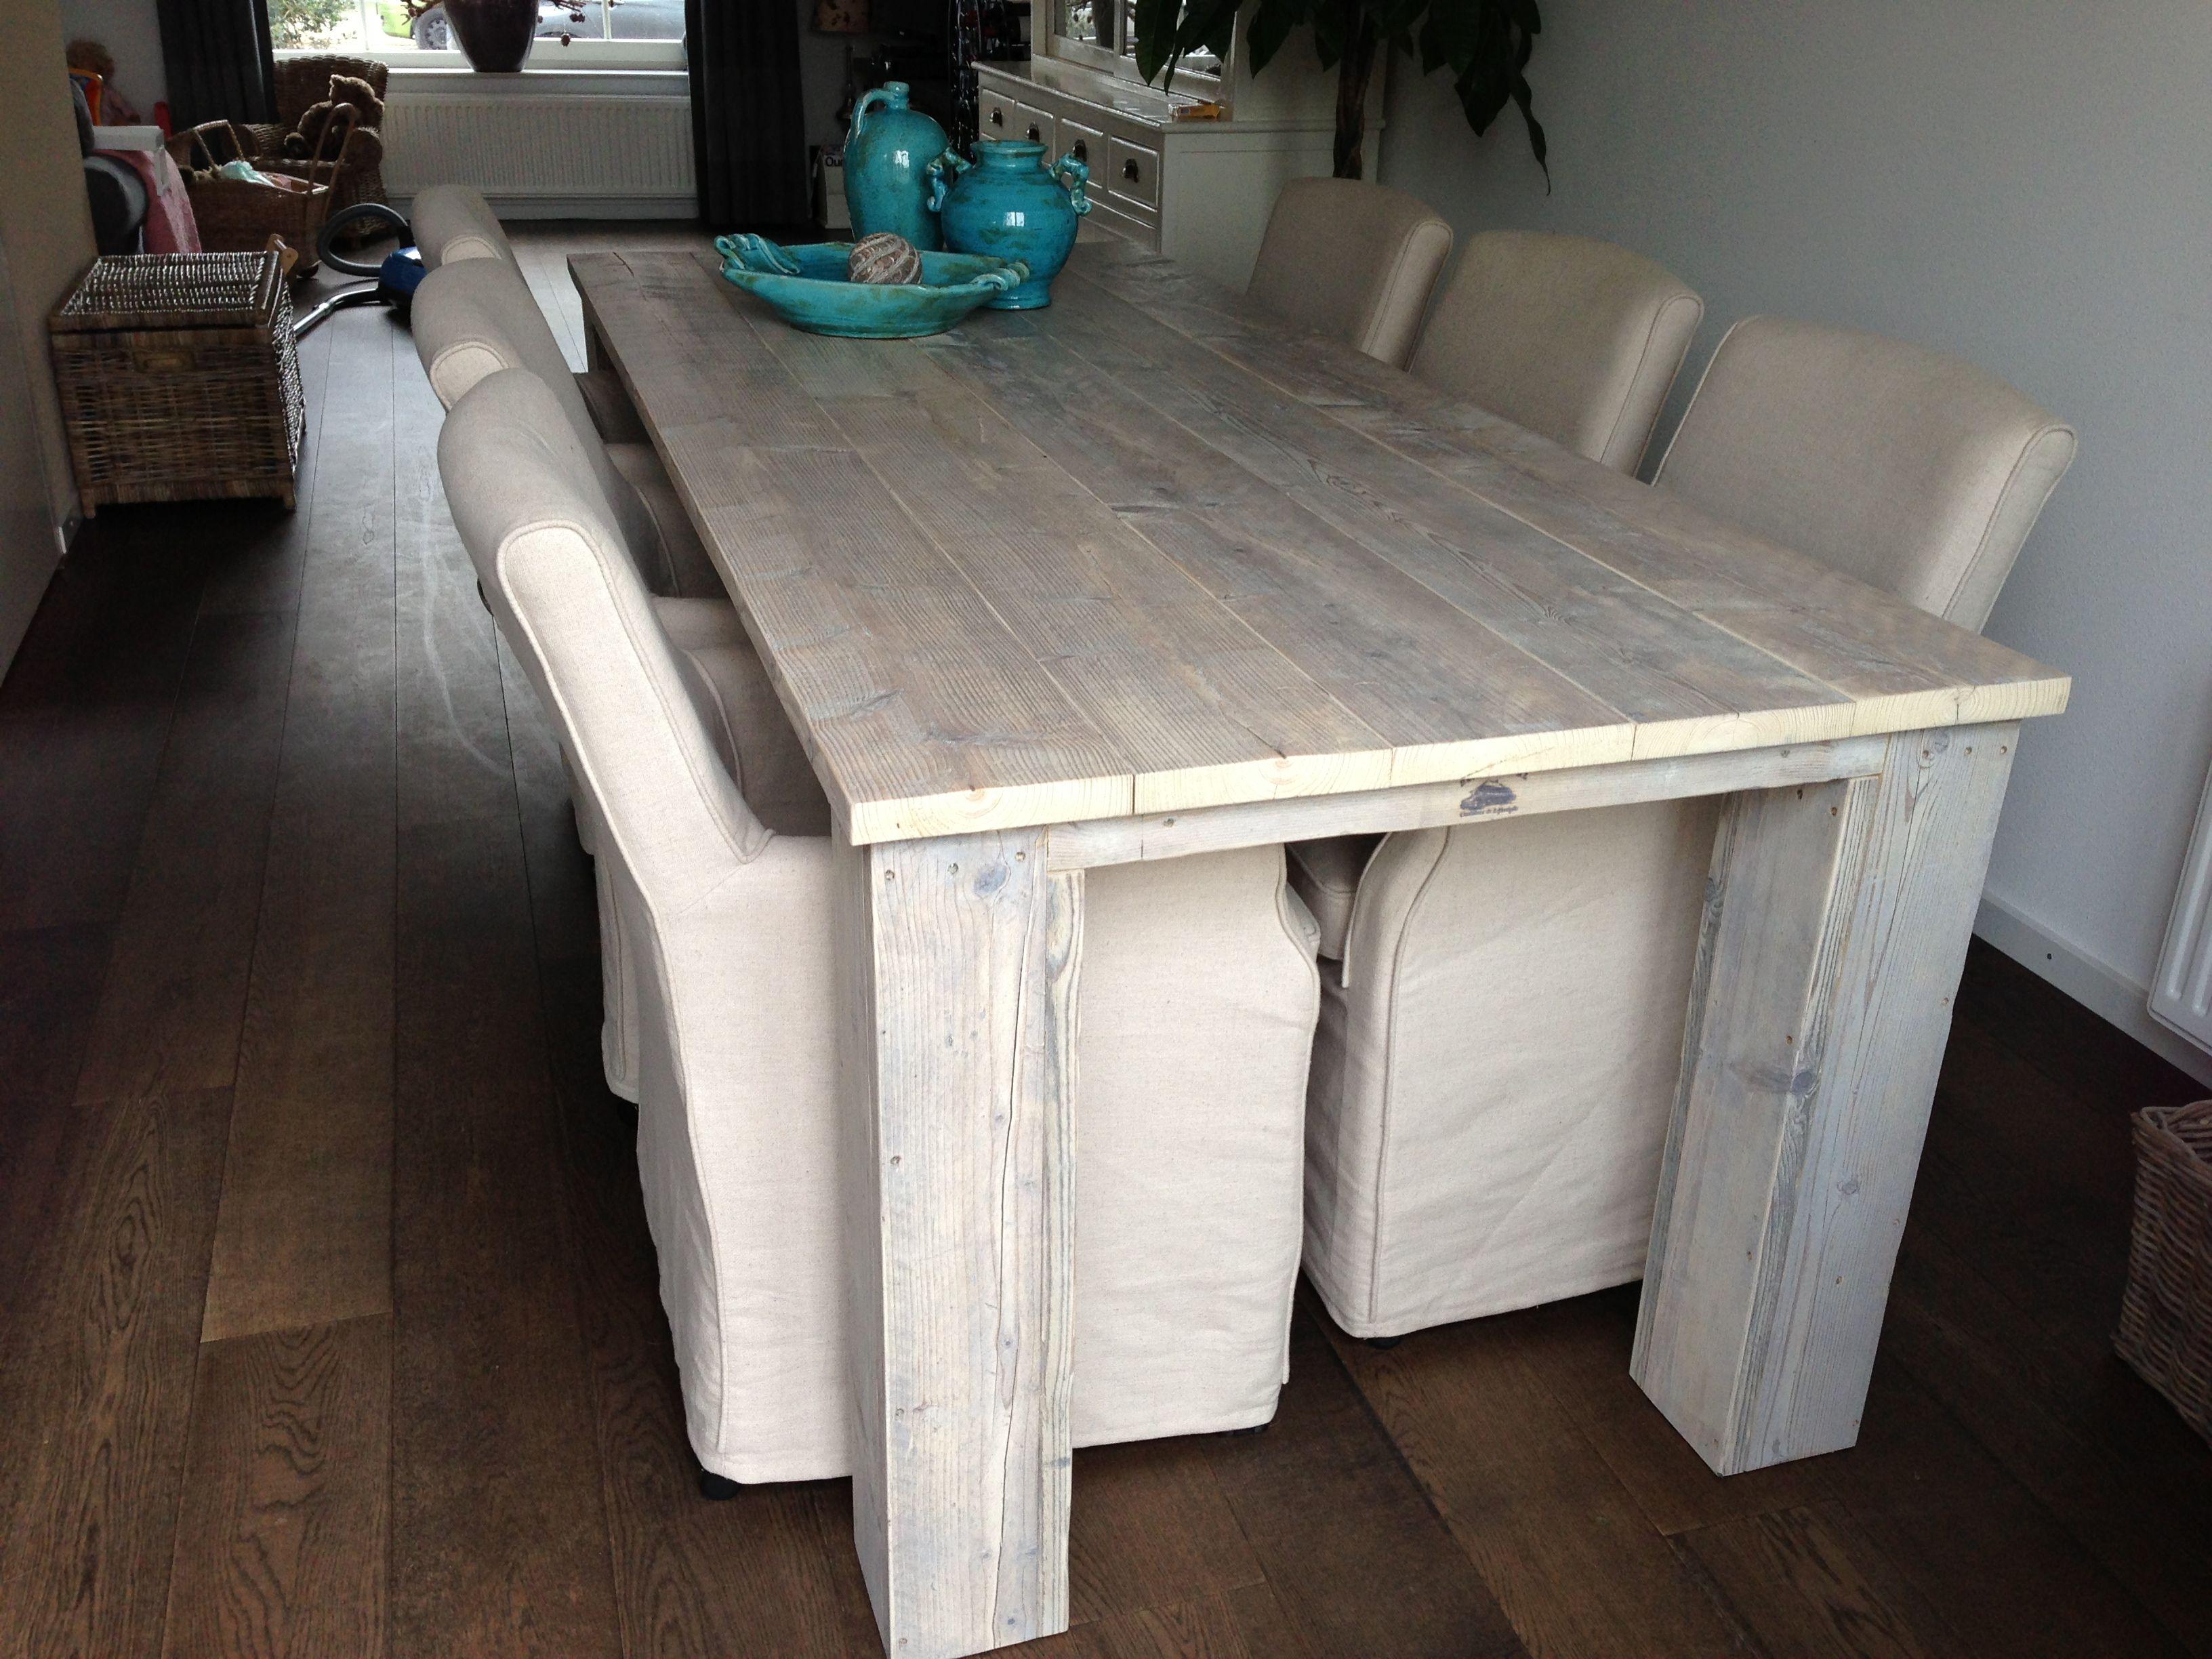 Eettafel White Wash.Tafel Van Oud Steigerhout Behandeld Met Twee X Whitewash Beits